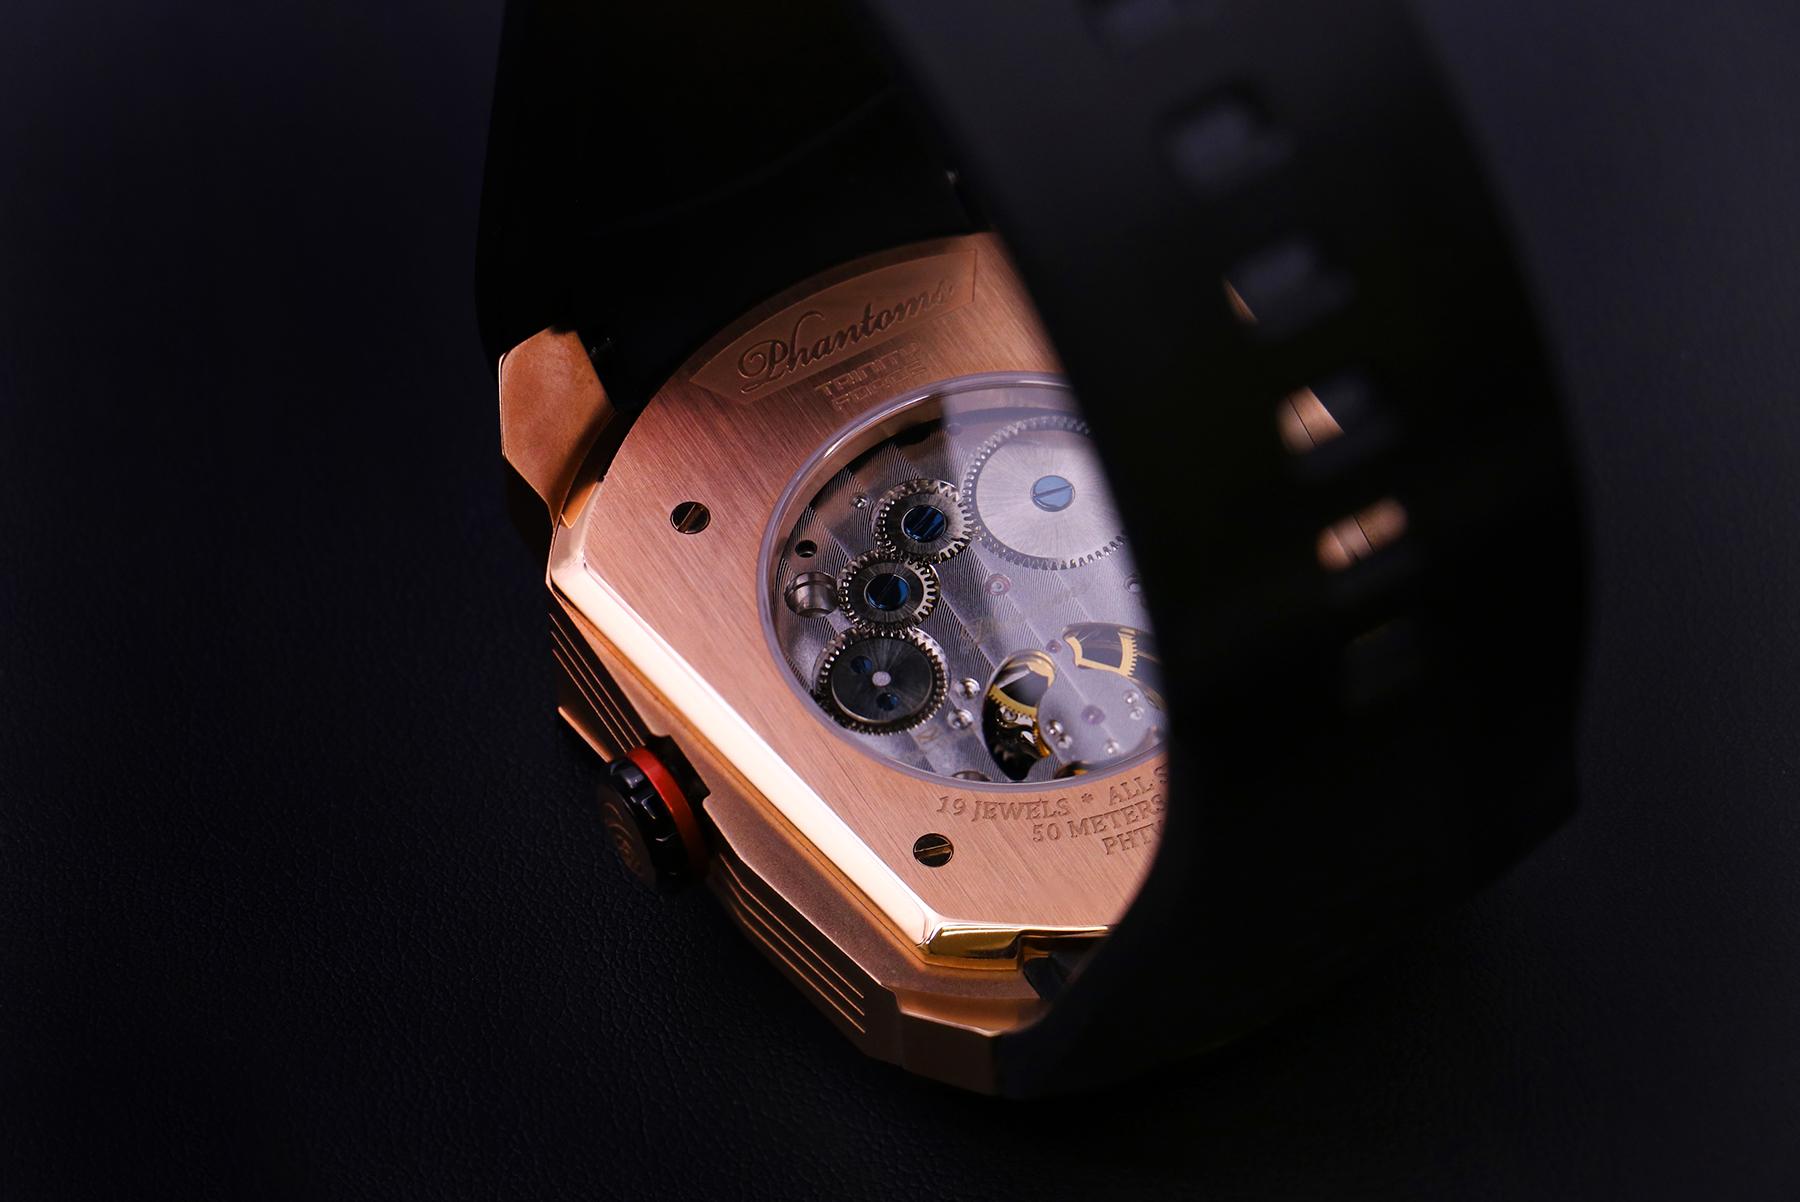 Phantoms Trinity Force Tourbillon Watch Series - 1325434